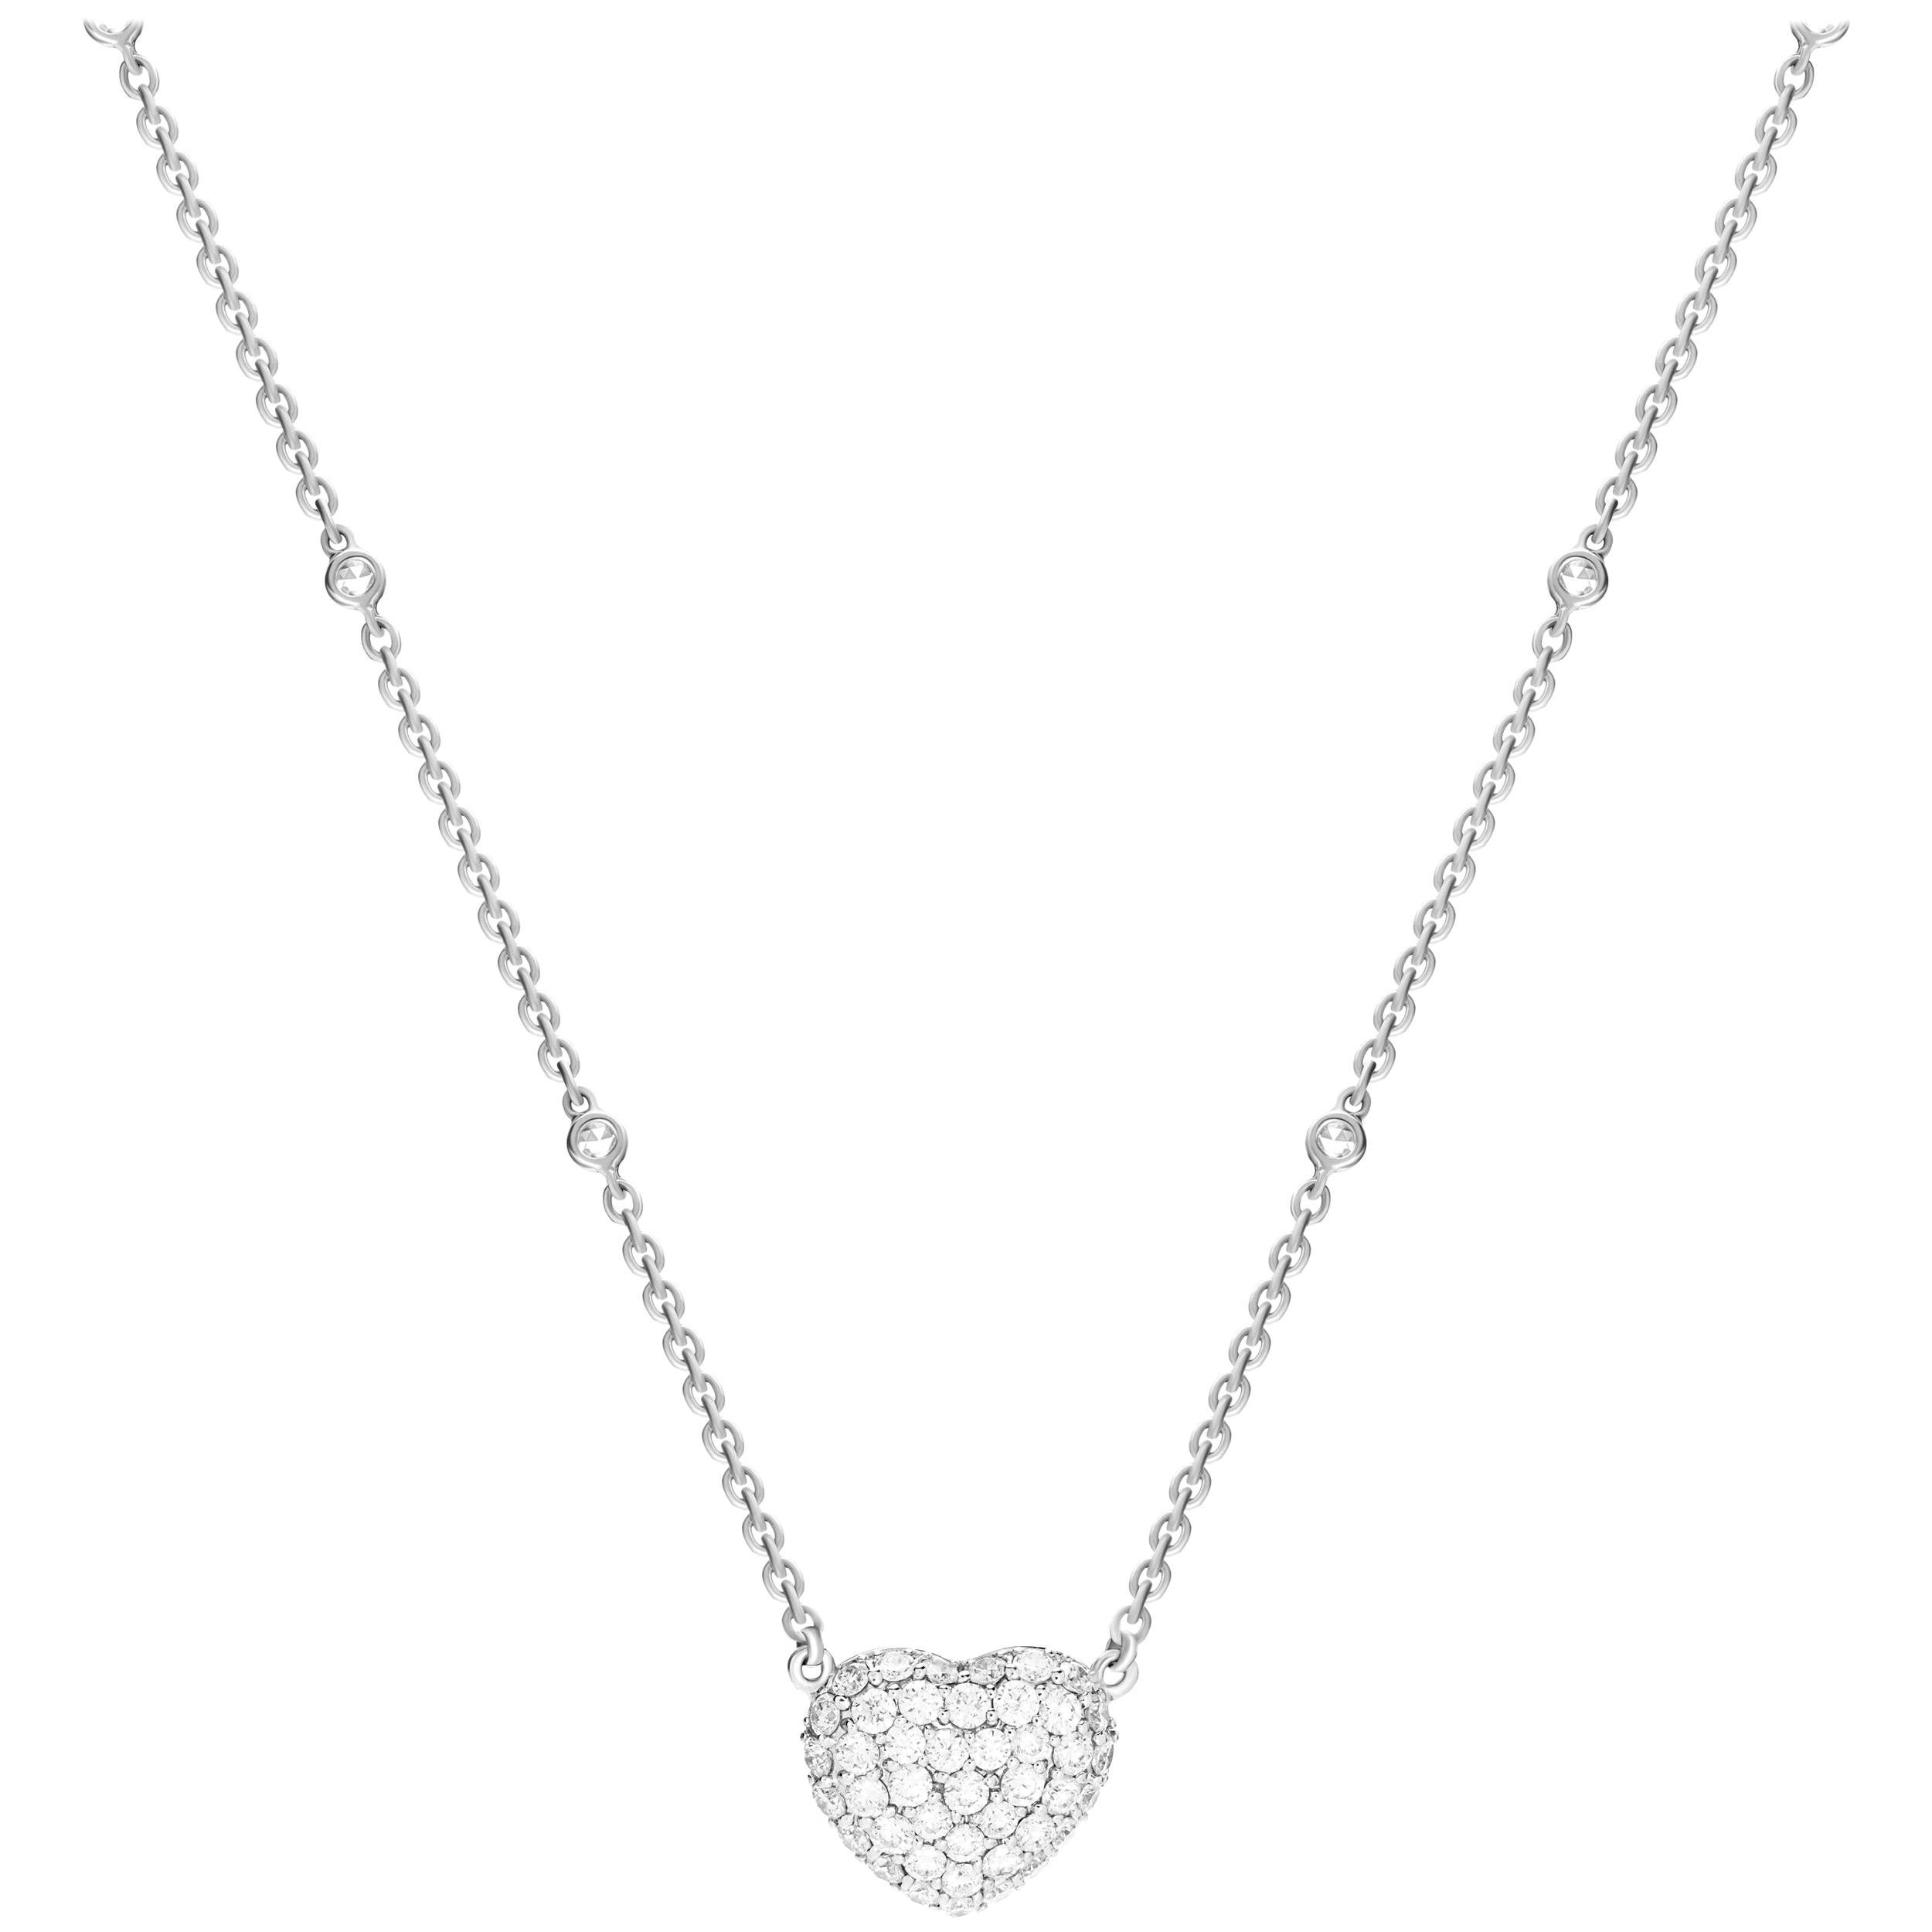 1.65 Carat Diamond 18 Karat White Gold Heart Pendant Necklace